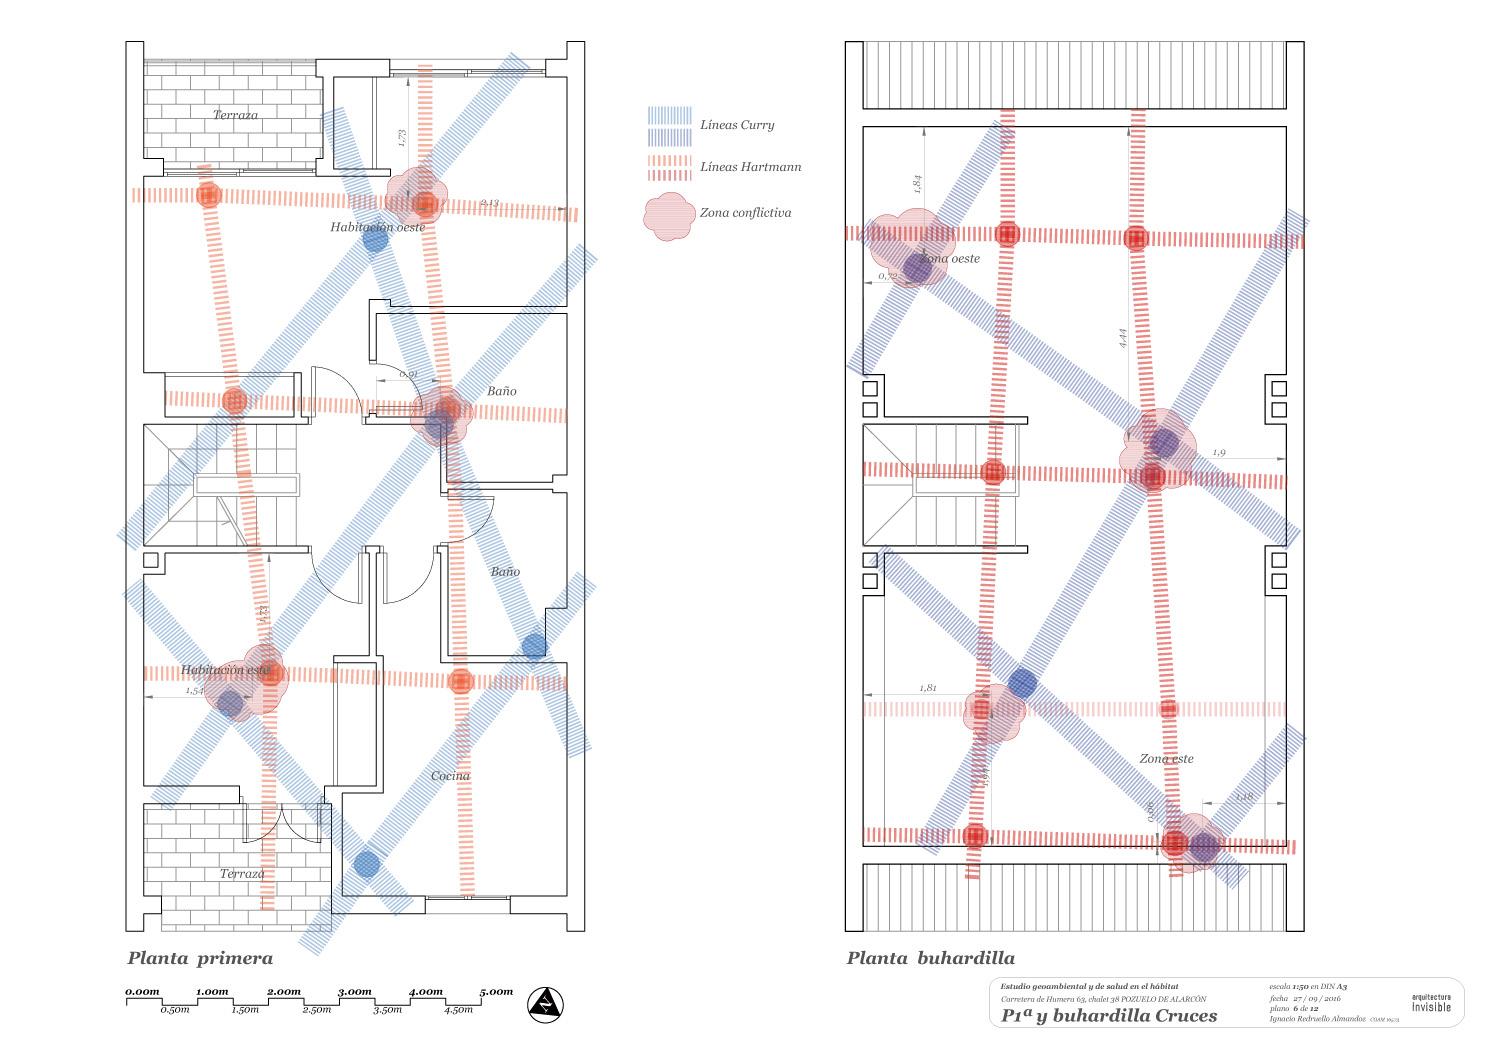 zonas geopatógenas arquitectura invisible